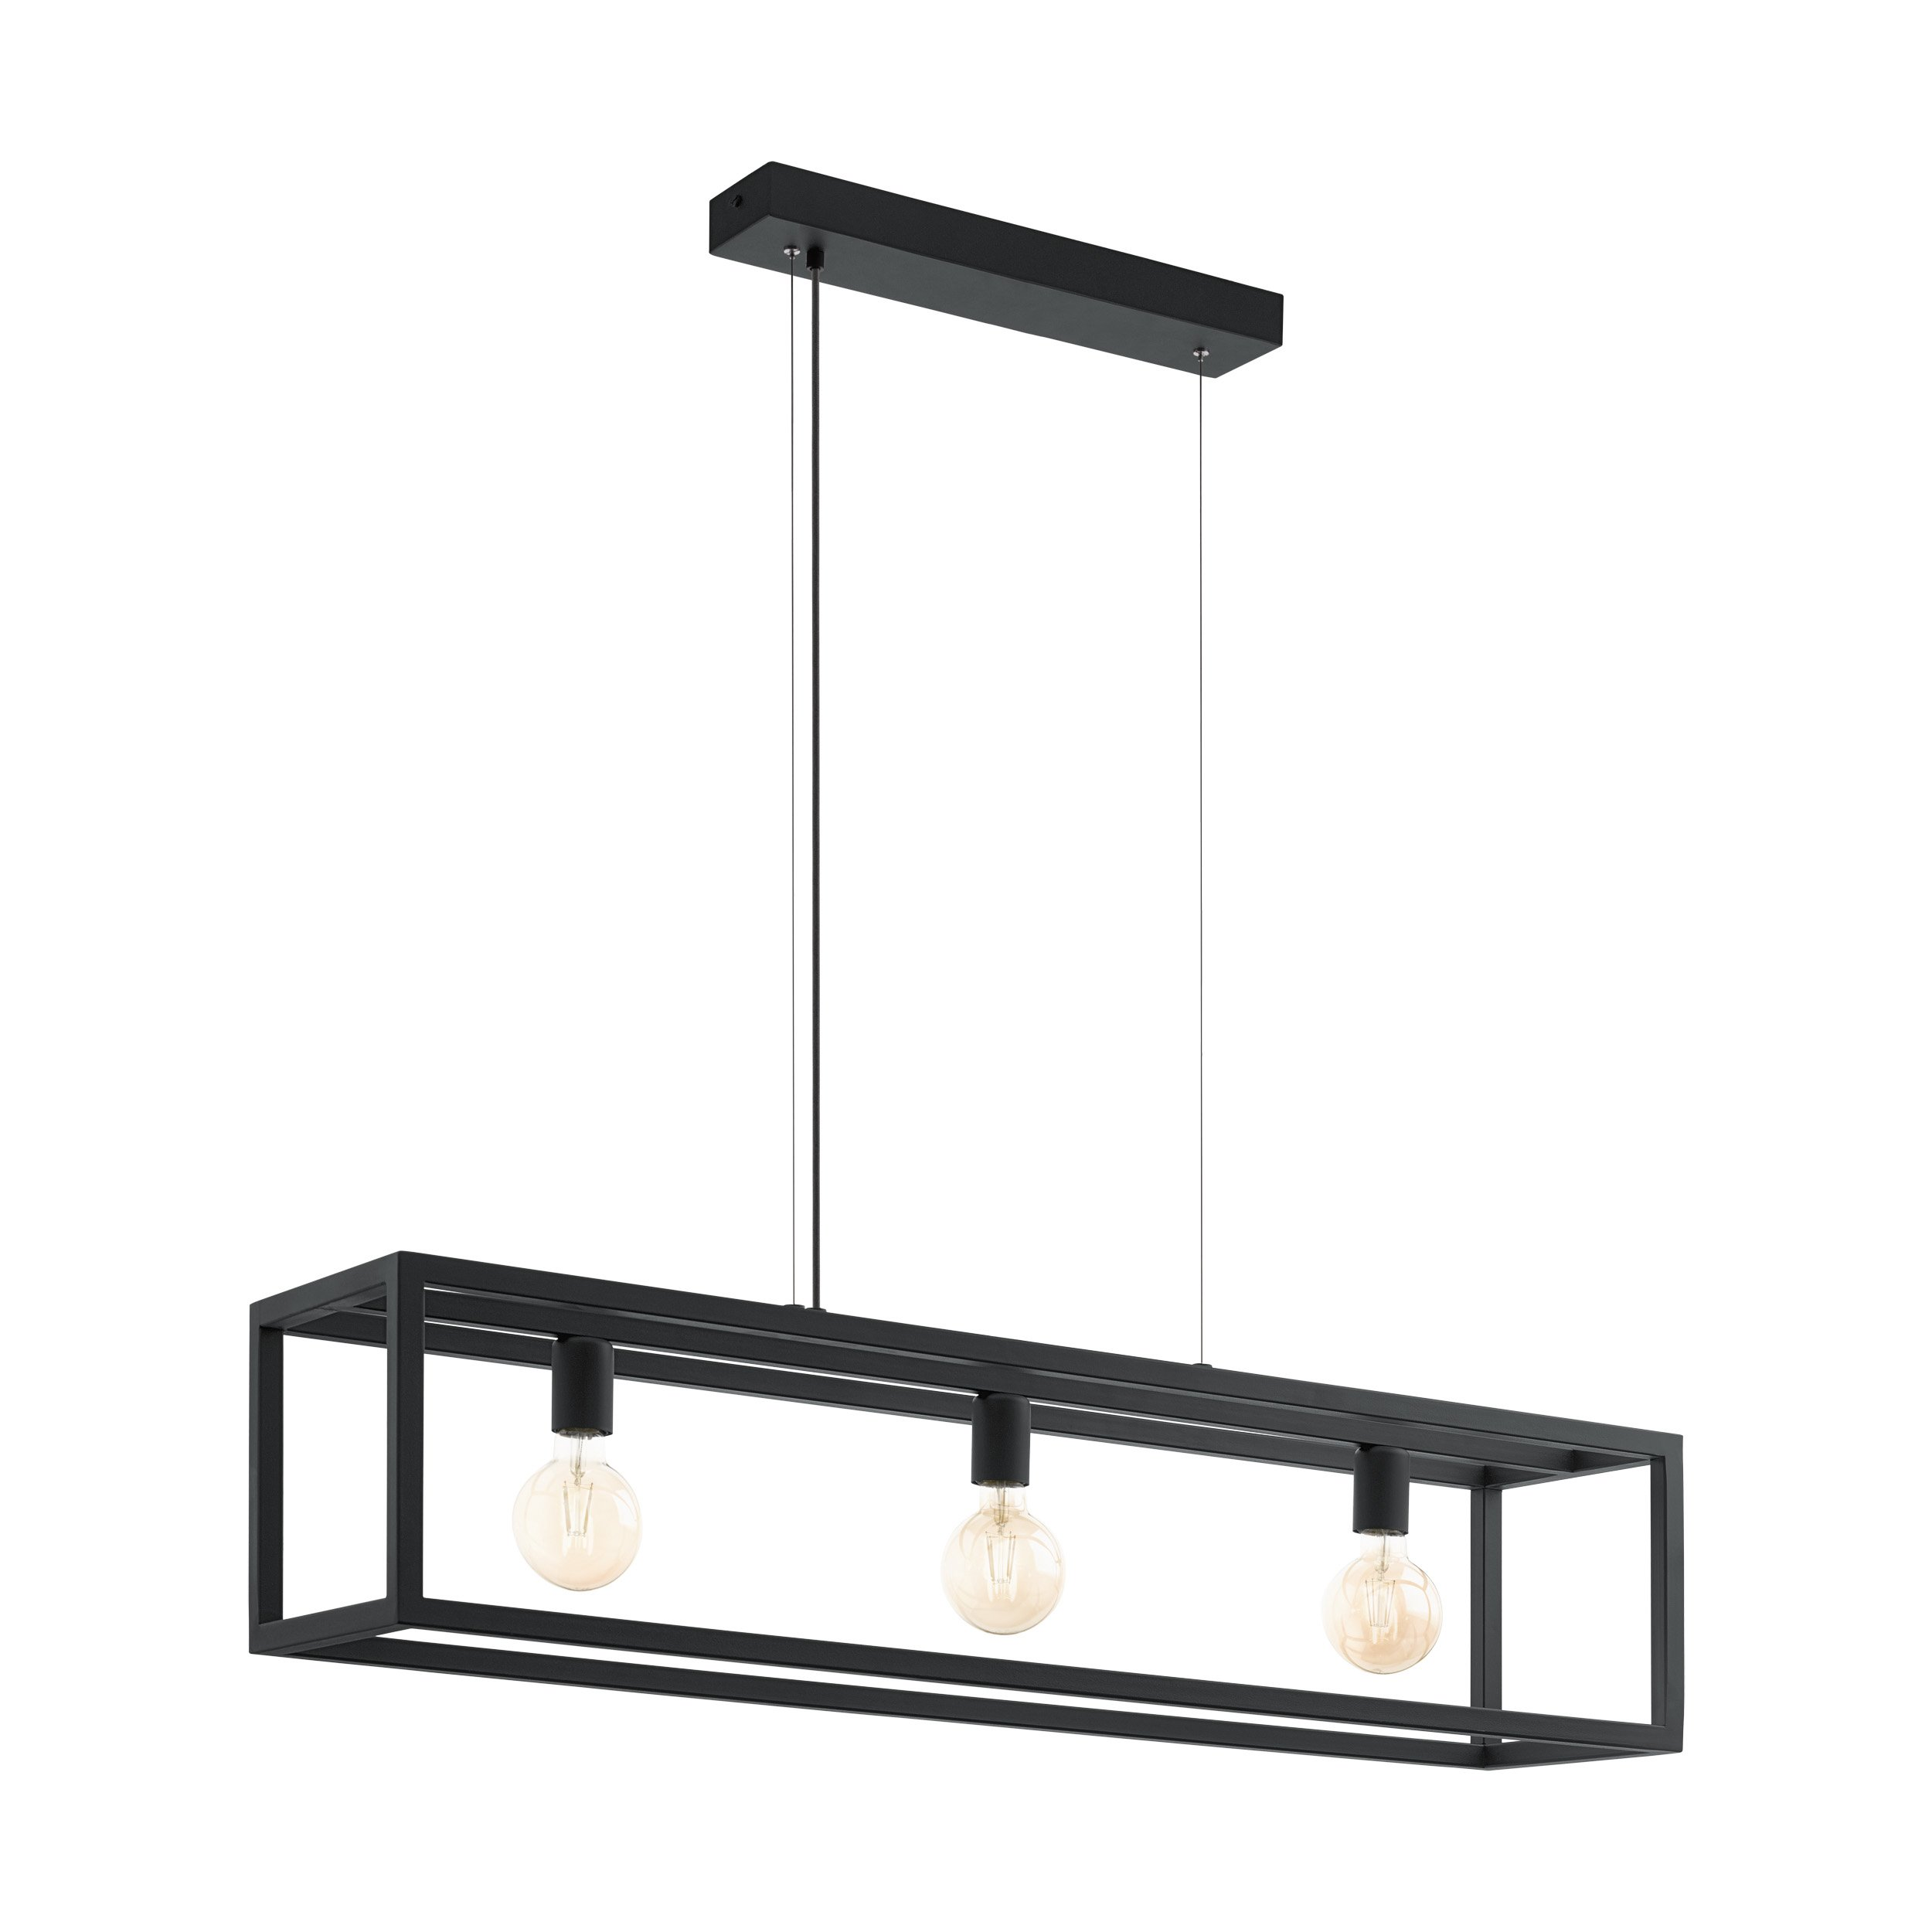 Eglo Elswick Hanglamp 3-lichts Zwart 110 cm